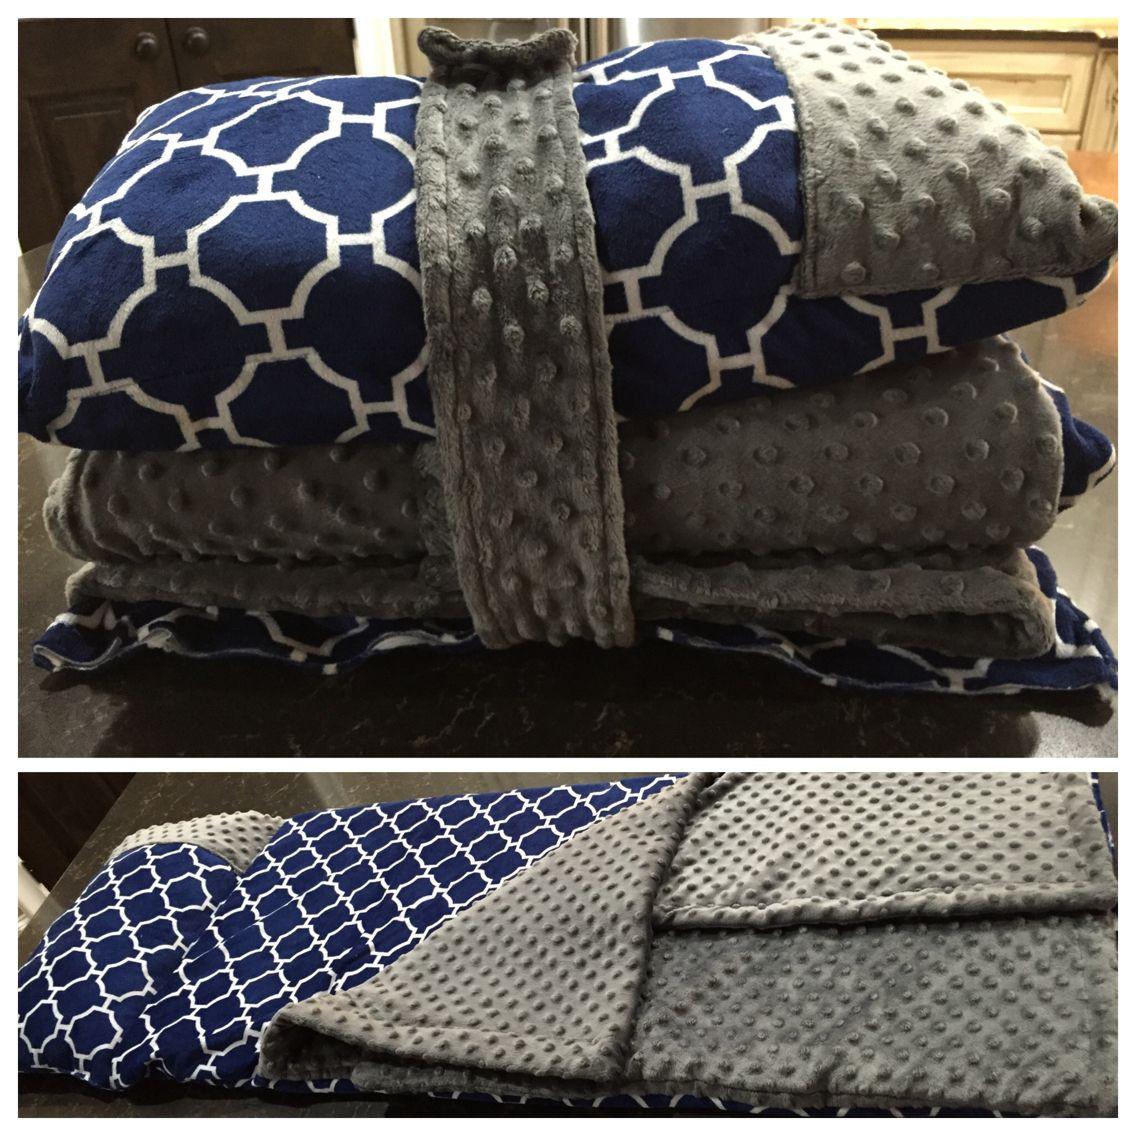 DIY Toddler Nap Mat  Finished Kindermat Nap Mat Cover